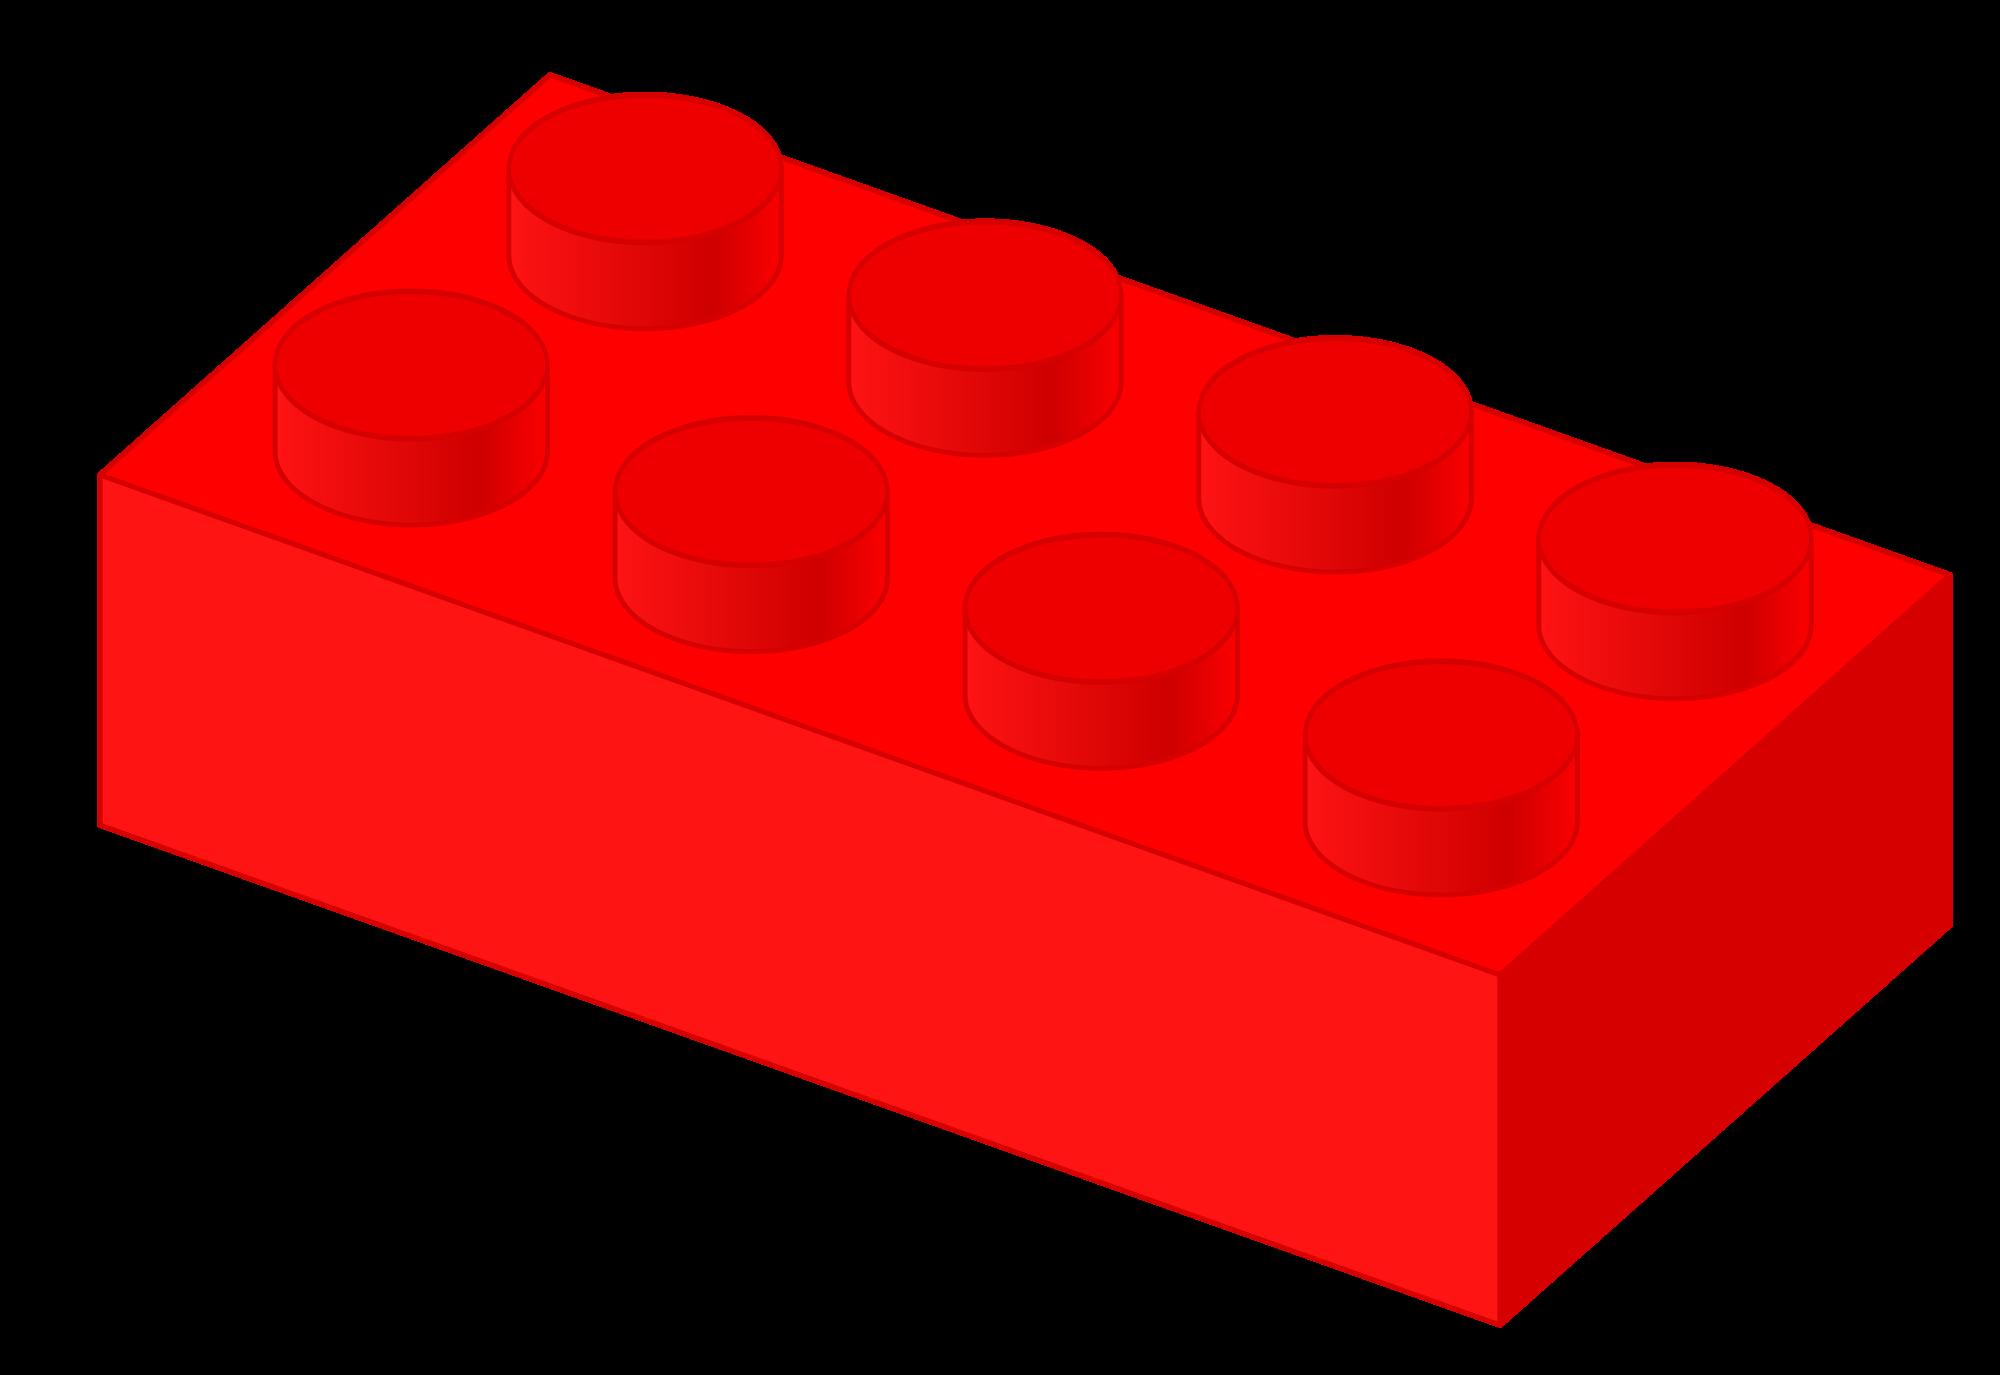 Brick svg #8, Download drawings